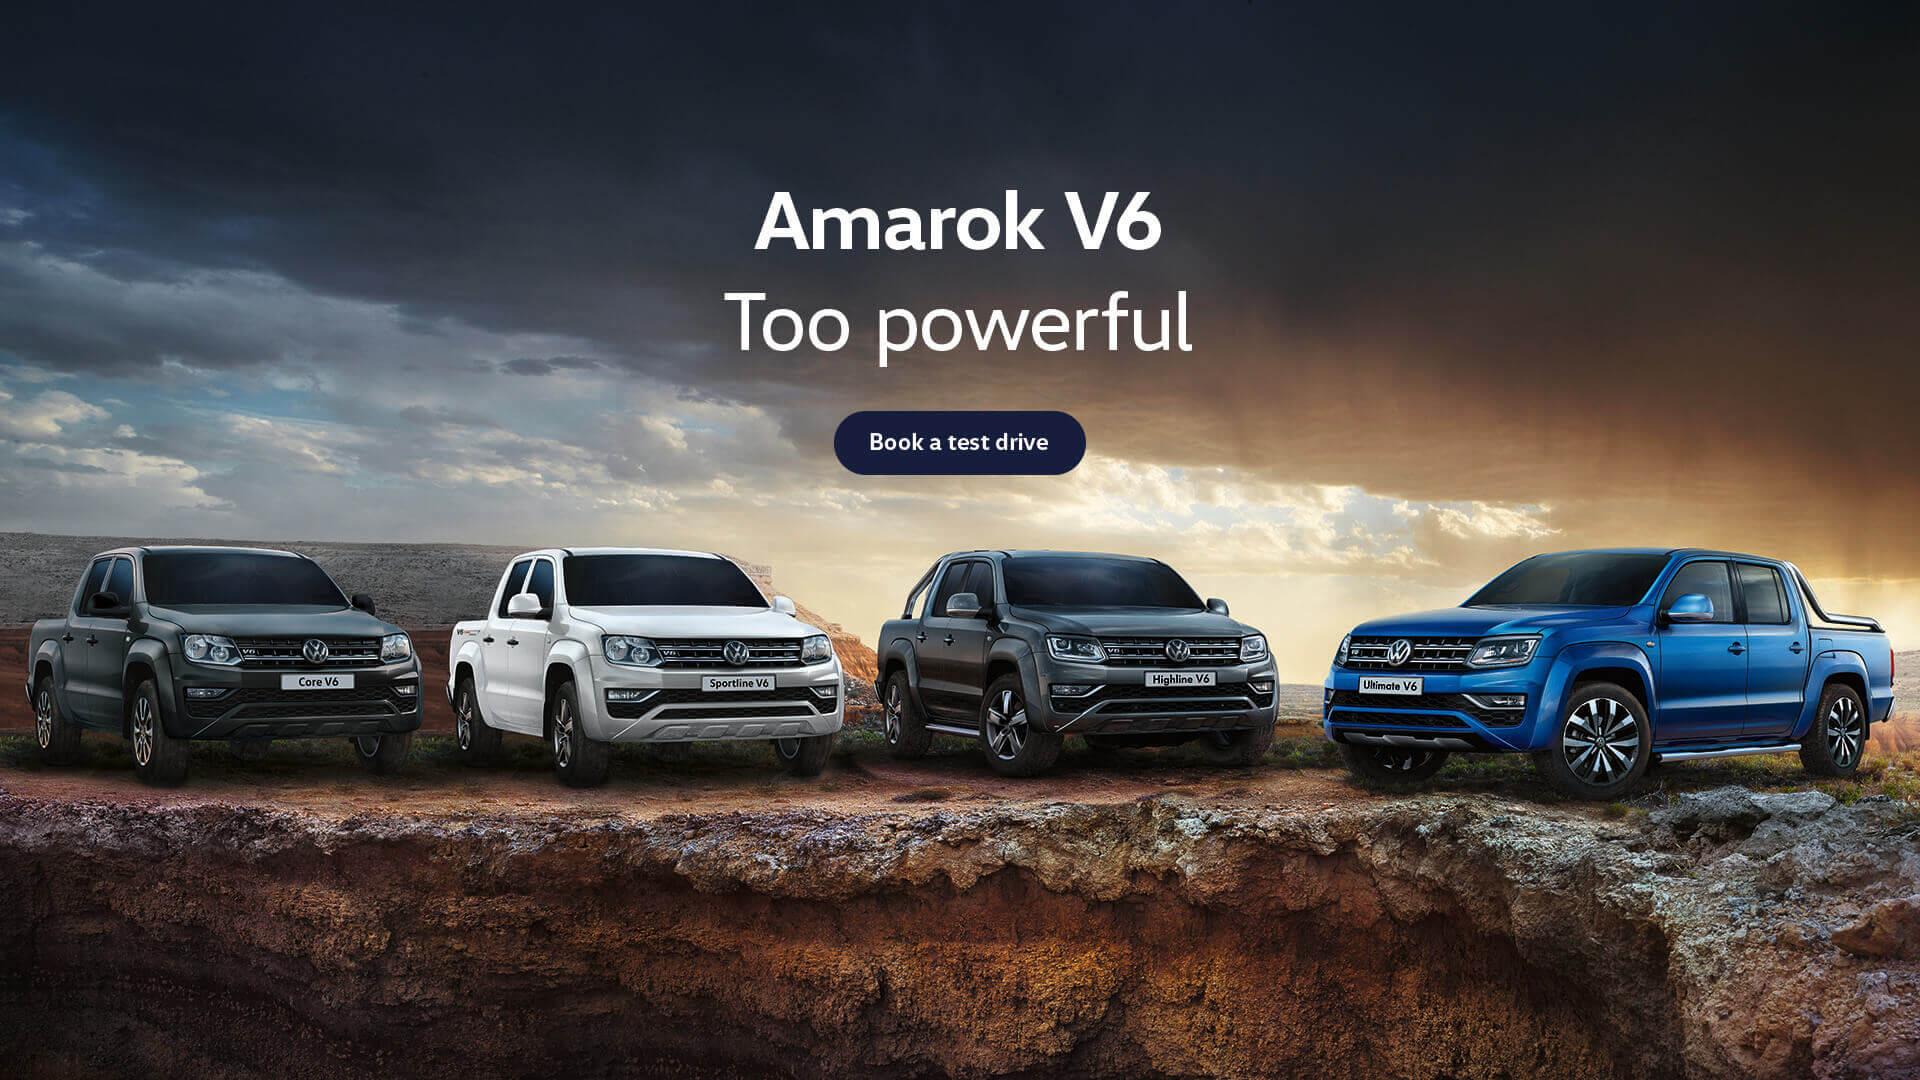 Amarok V6. Too powerful. Test drive today at Norris Motor Group Volkswagen, Brisbane